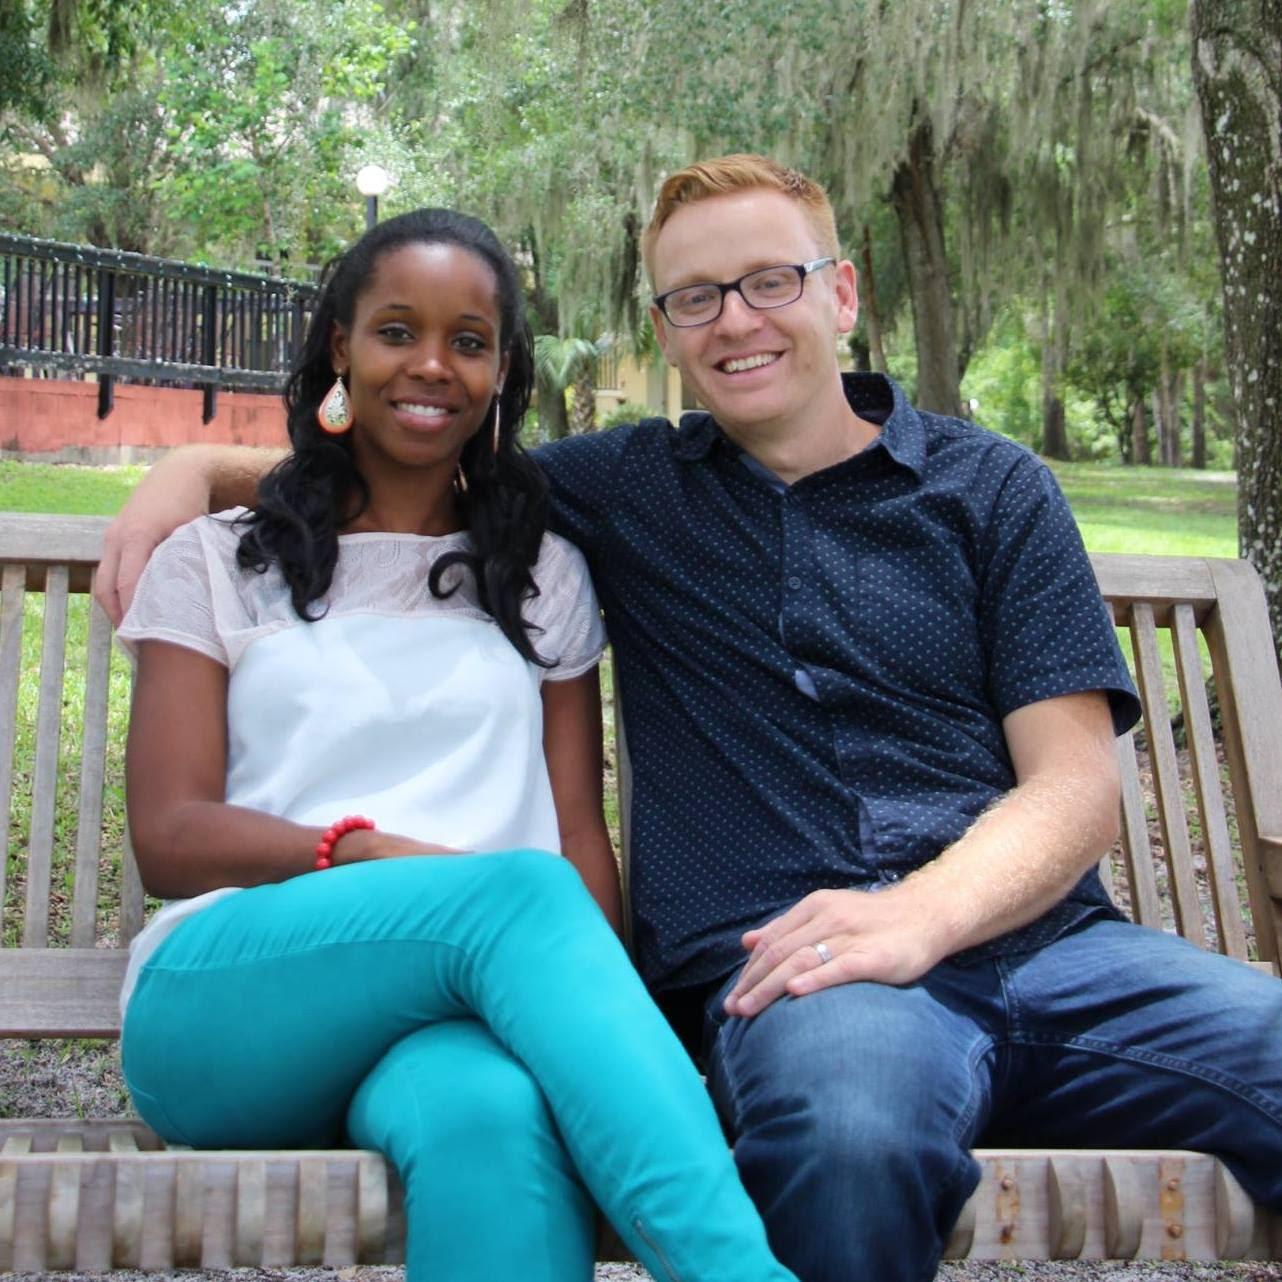 Caleb and his wife Latoya.